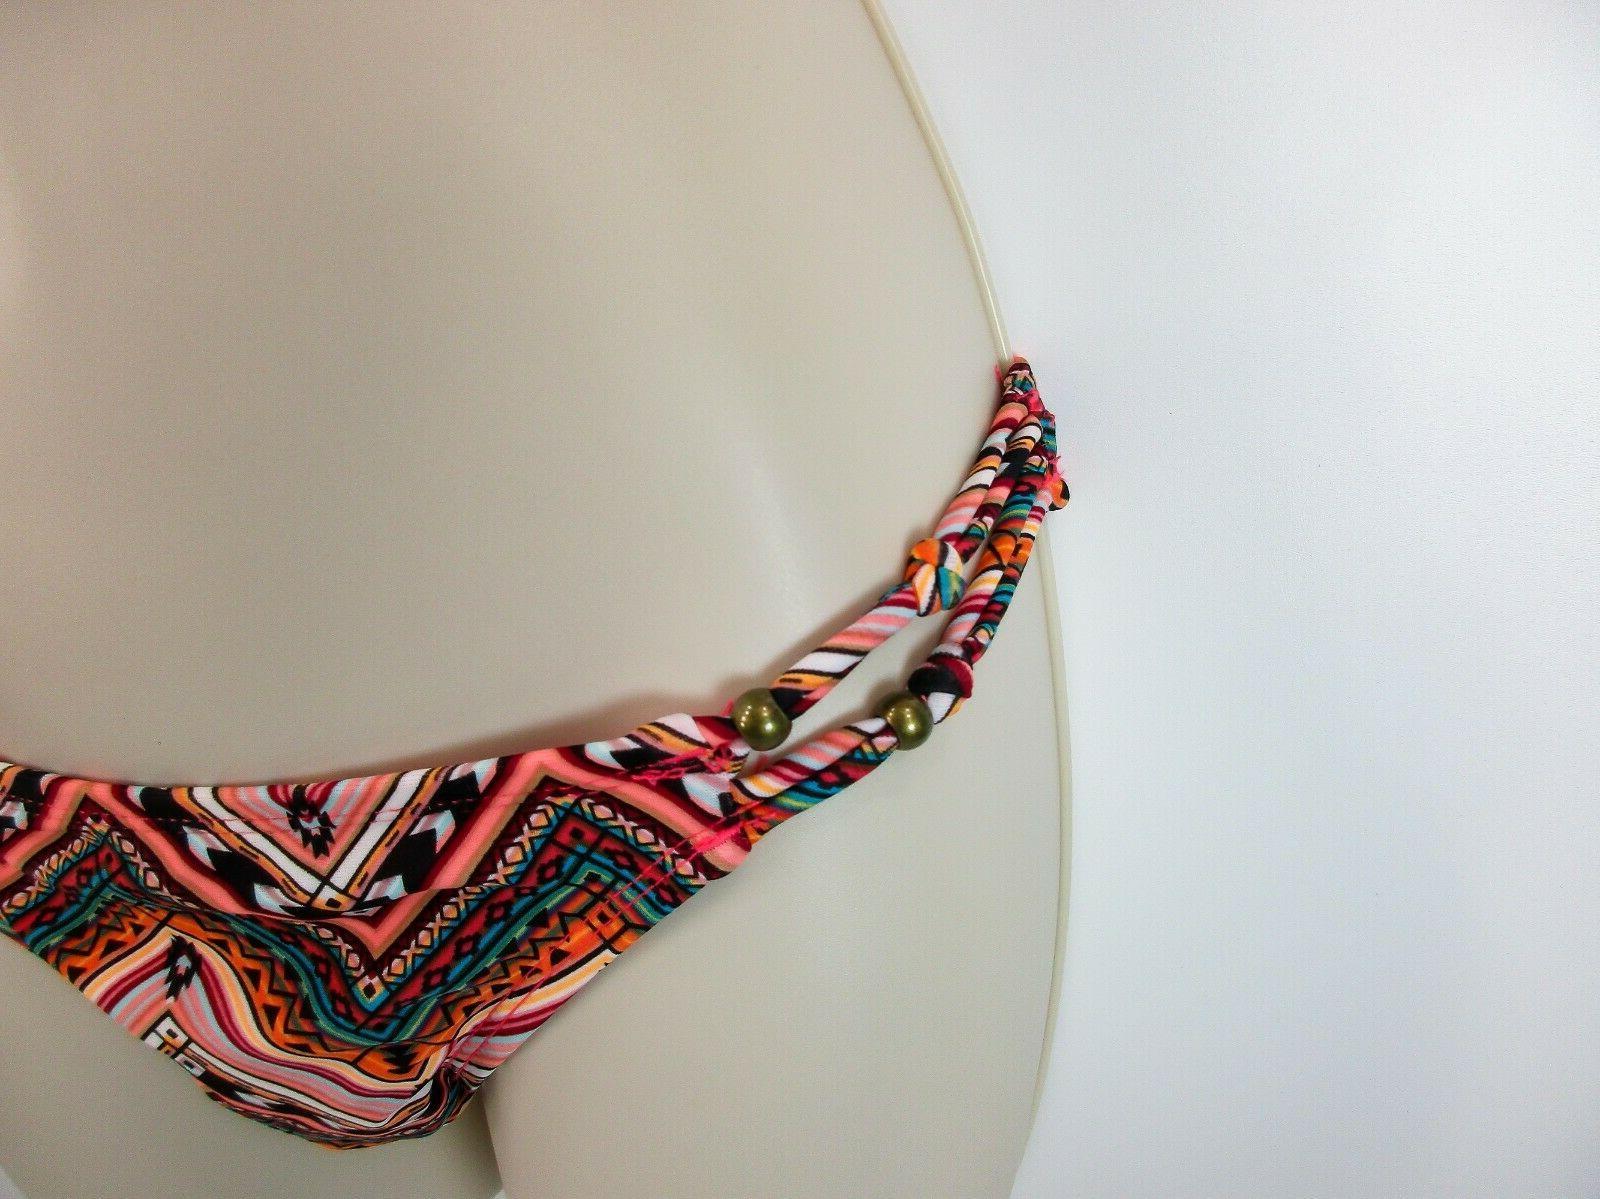 Hobie Bikini, Bathing Suit, Triangle Top